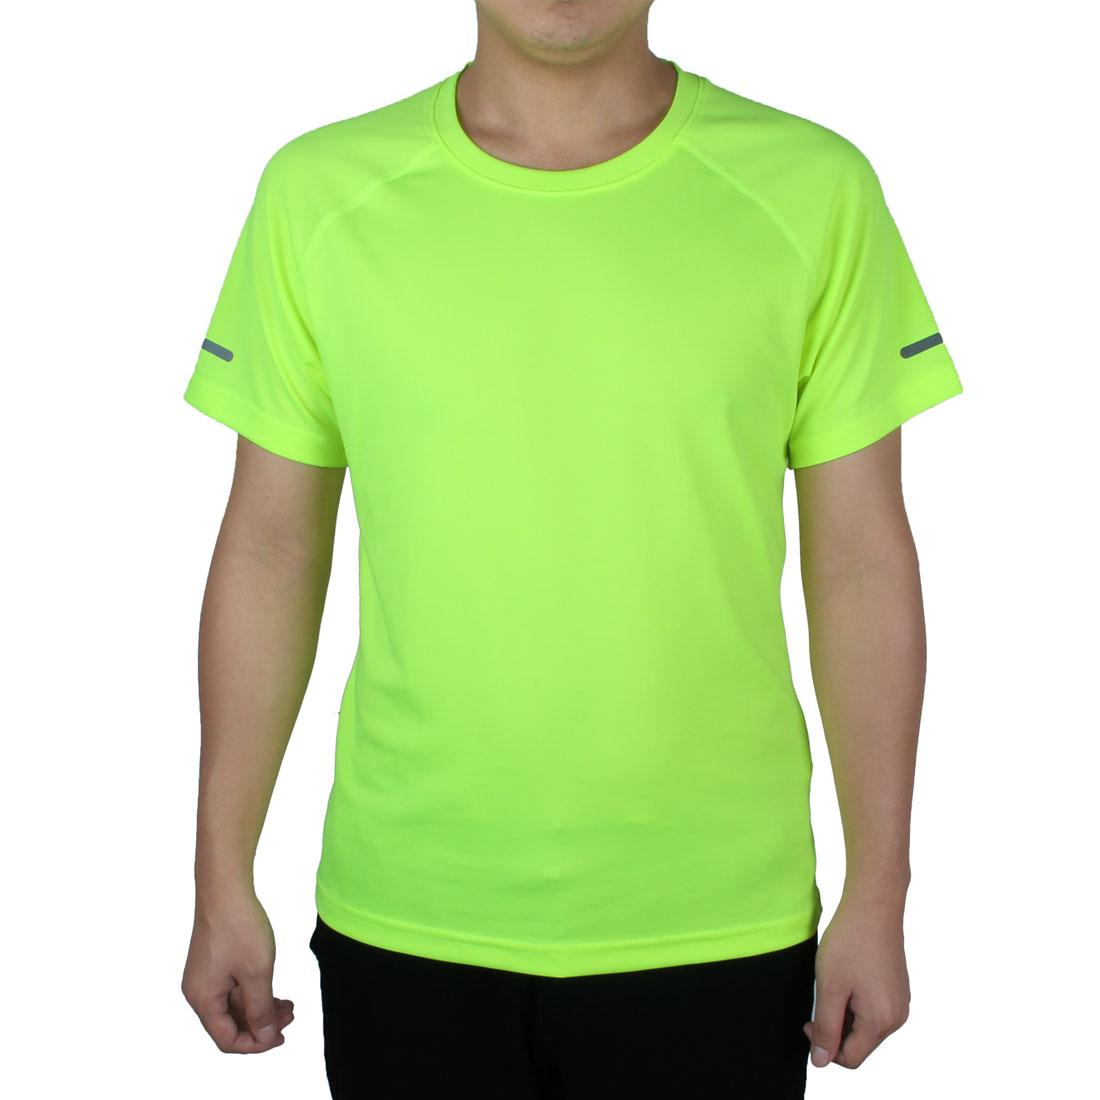 Short Sleeve Clothes Reflective Basketball Sports T-shirt Fluorescent Green S